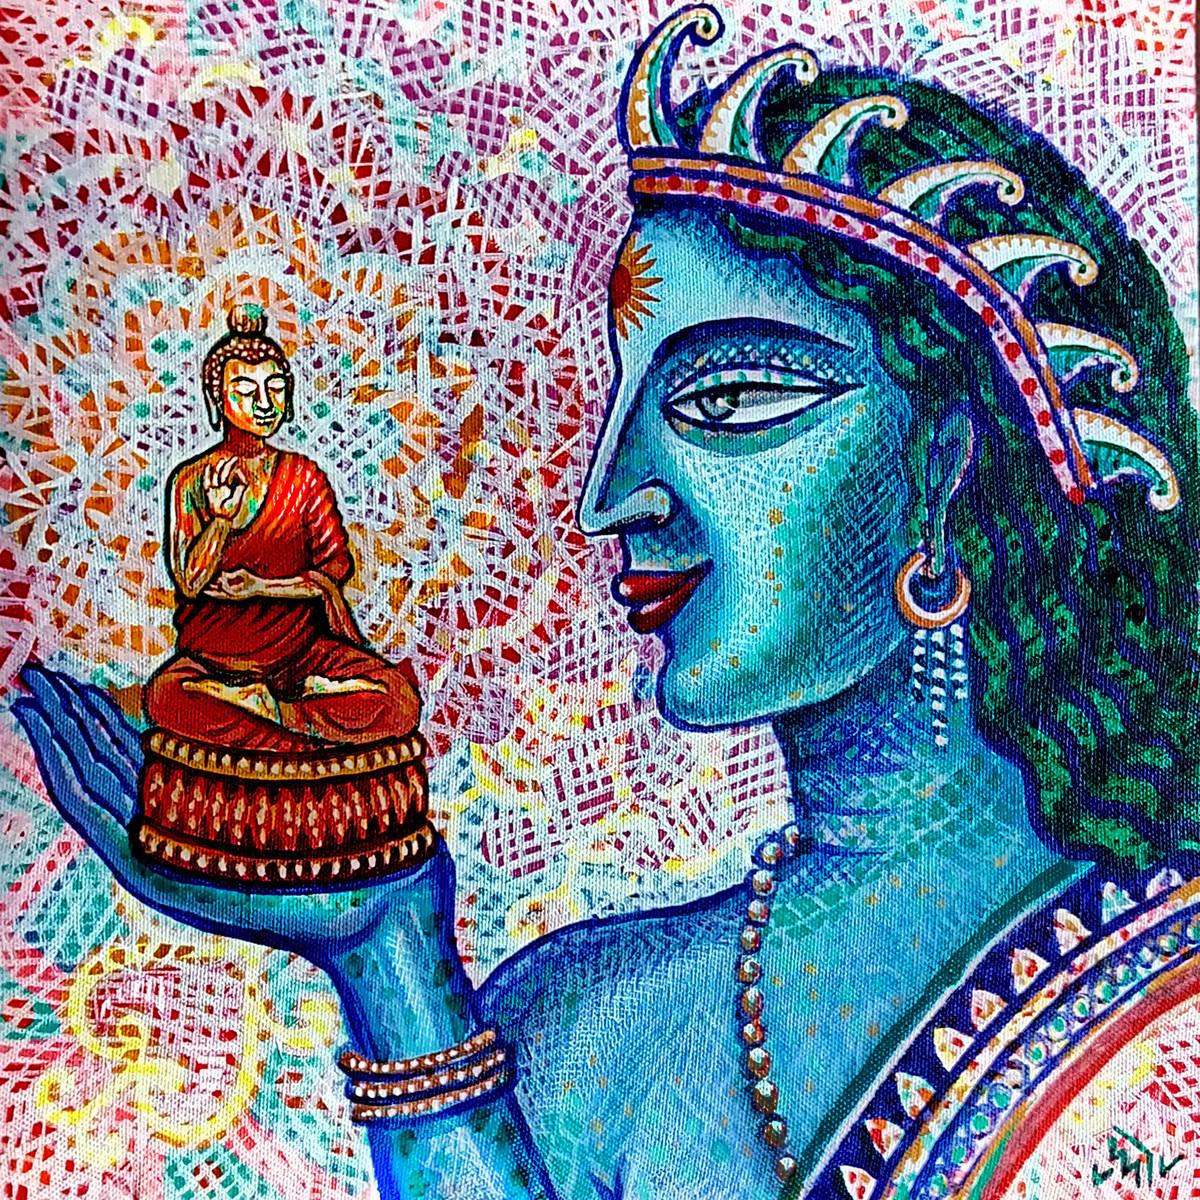 THE IDOL MAKER Digital Print by Pradip Sarkar,Decorative